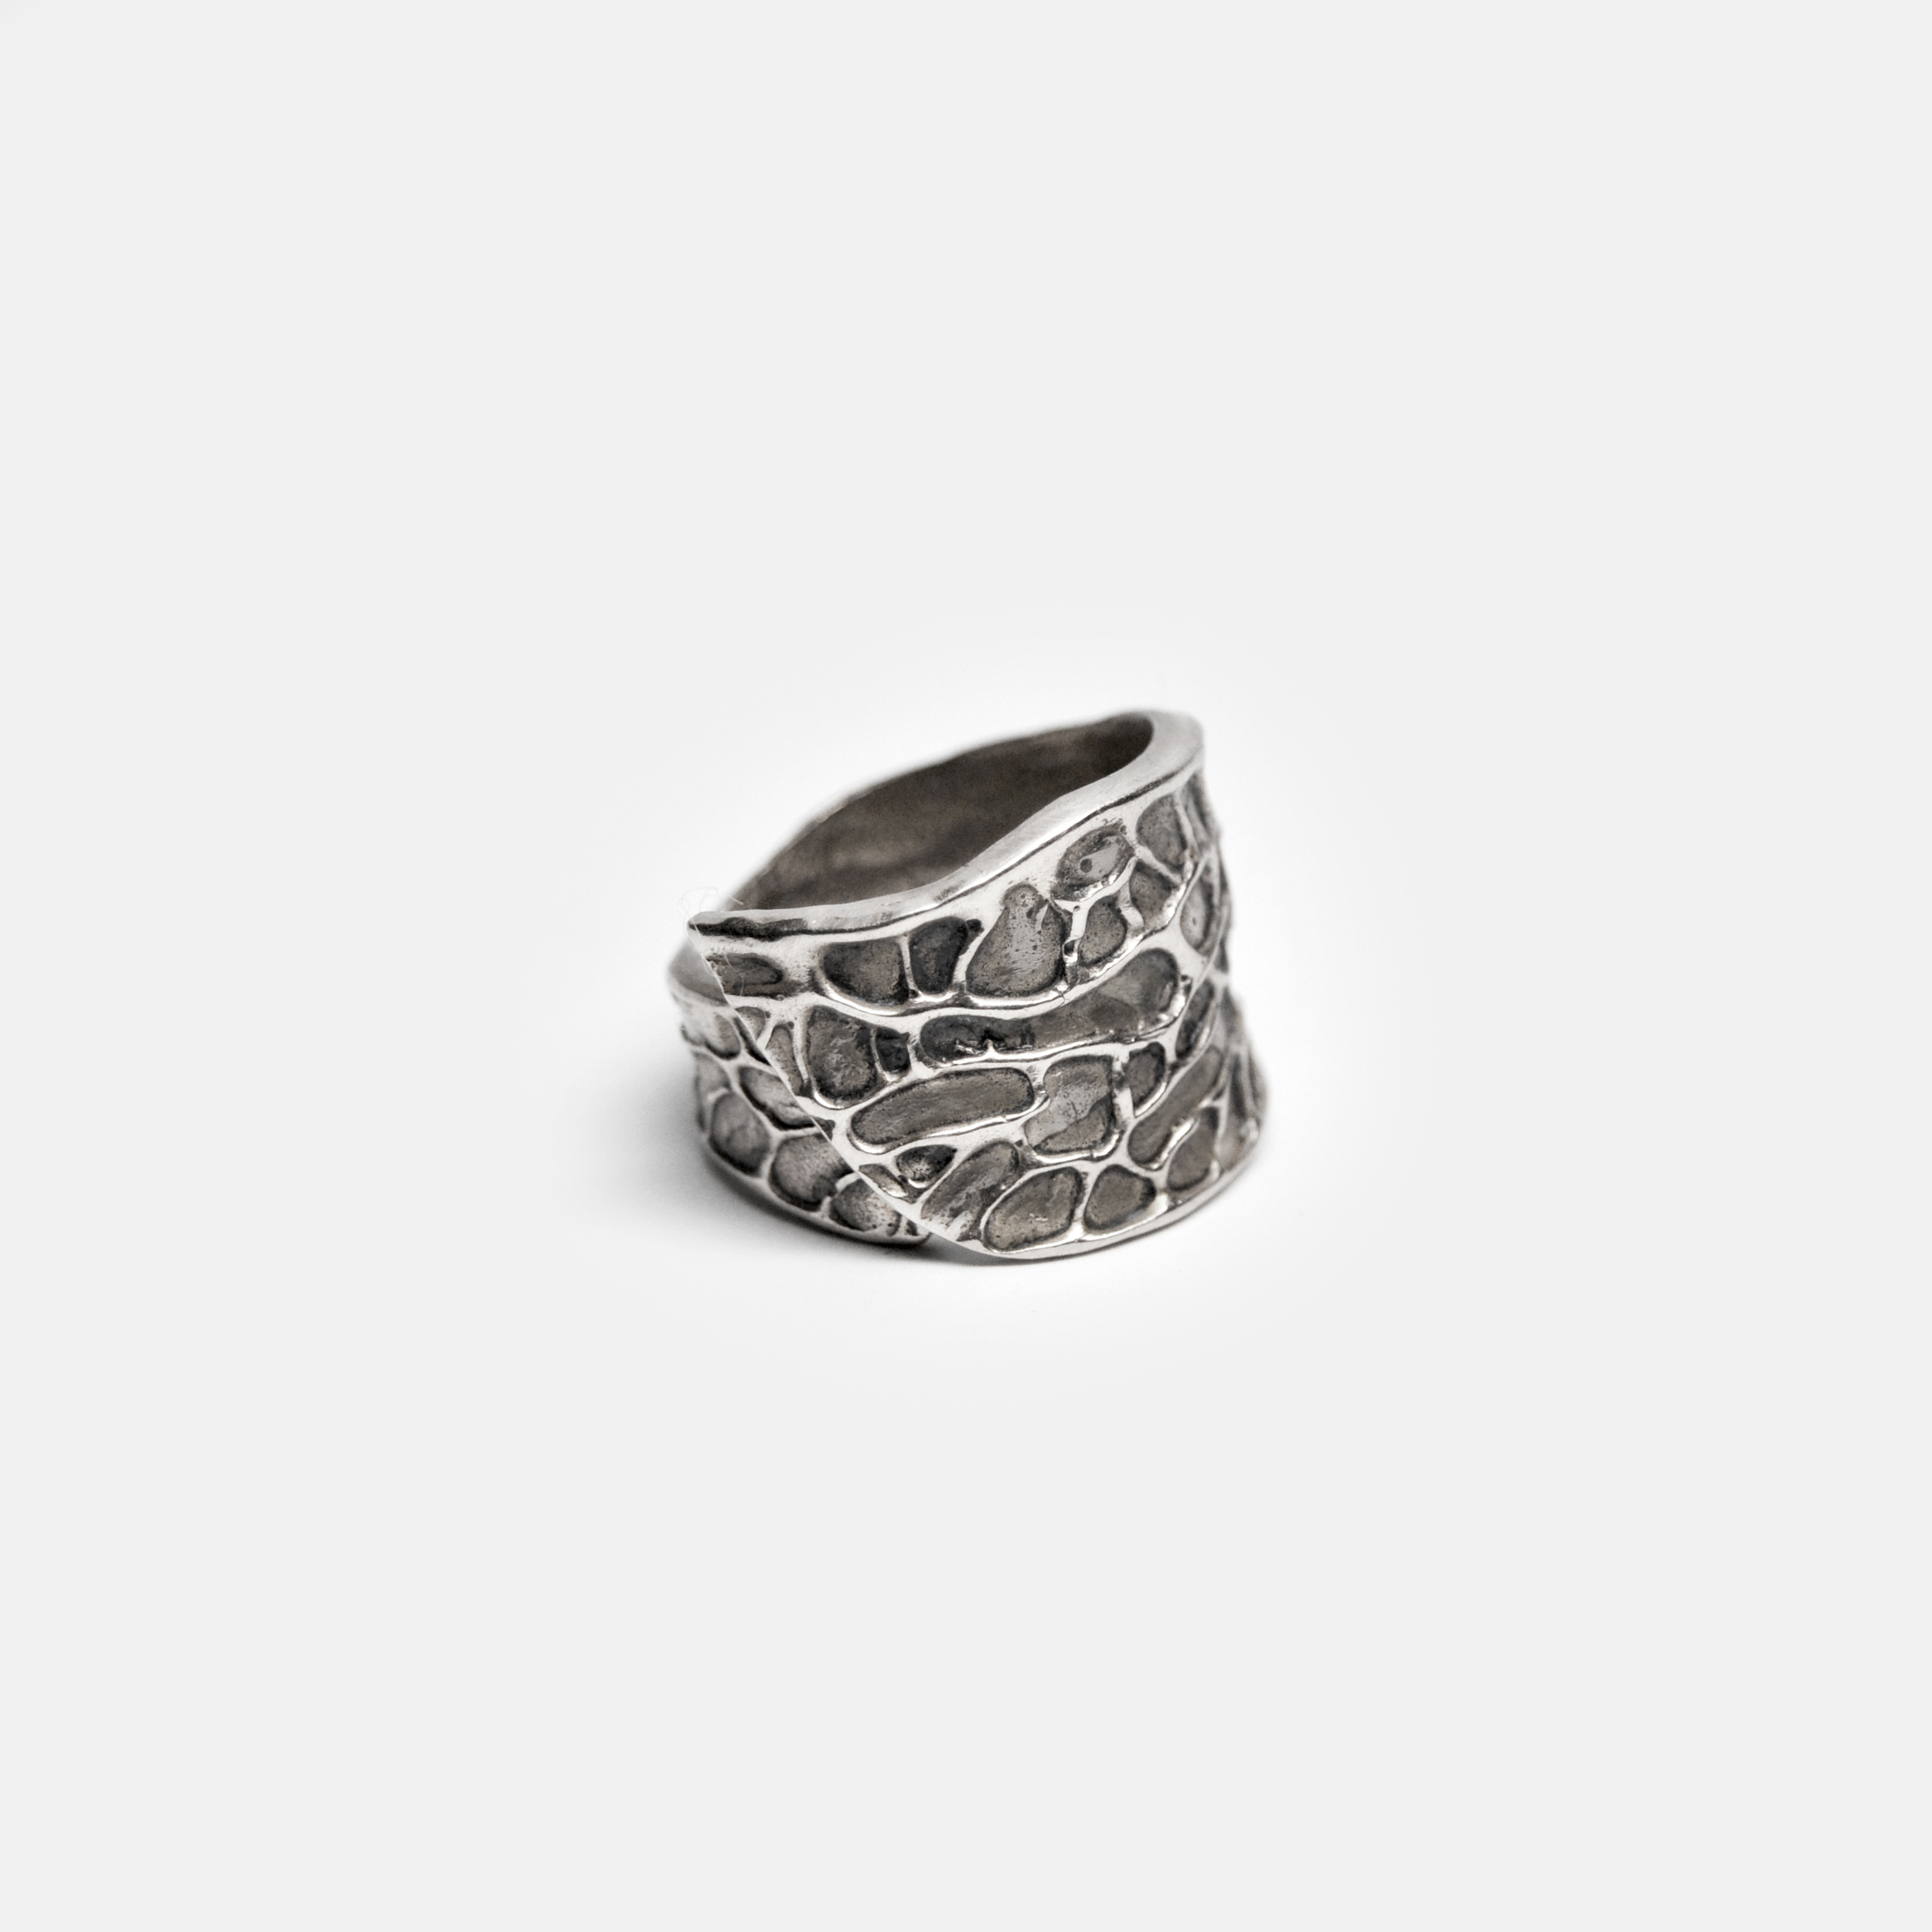 Marisa_Lomonaco_Hudson_Valley_custom_Jewelry_lathe_0000_Coral_Lace_Ring_Silver.jpg